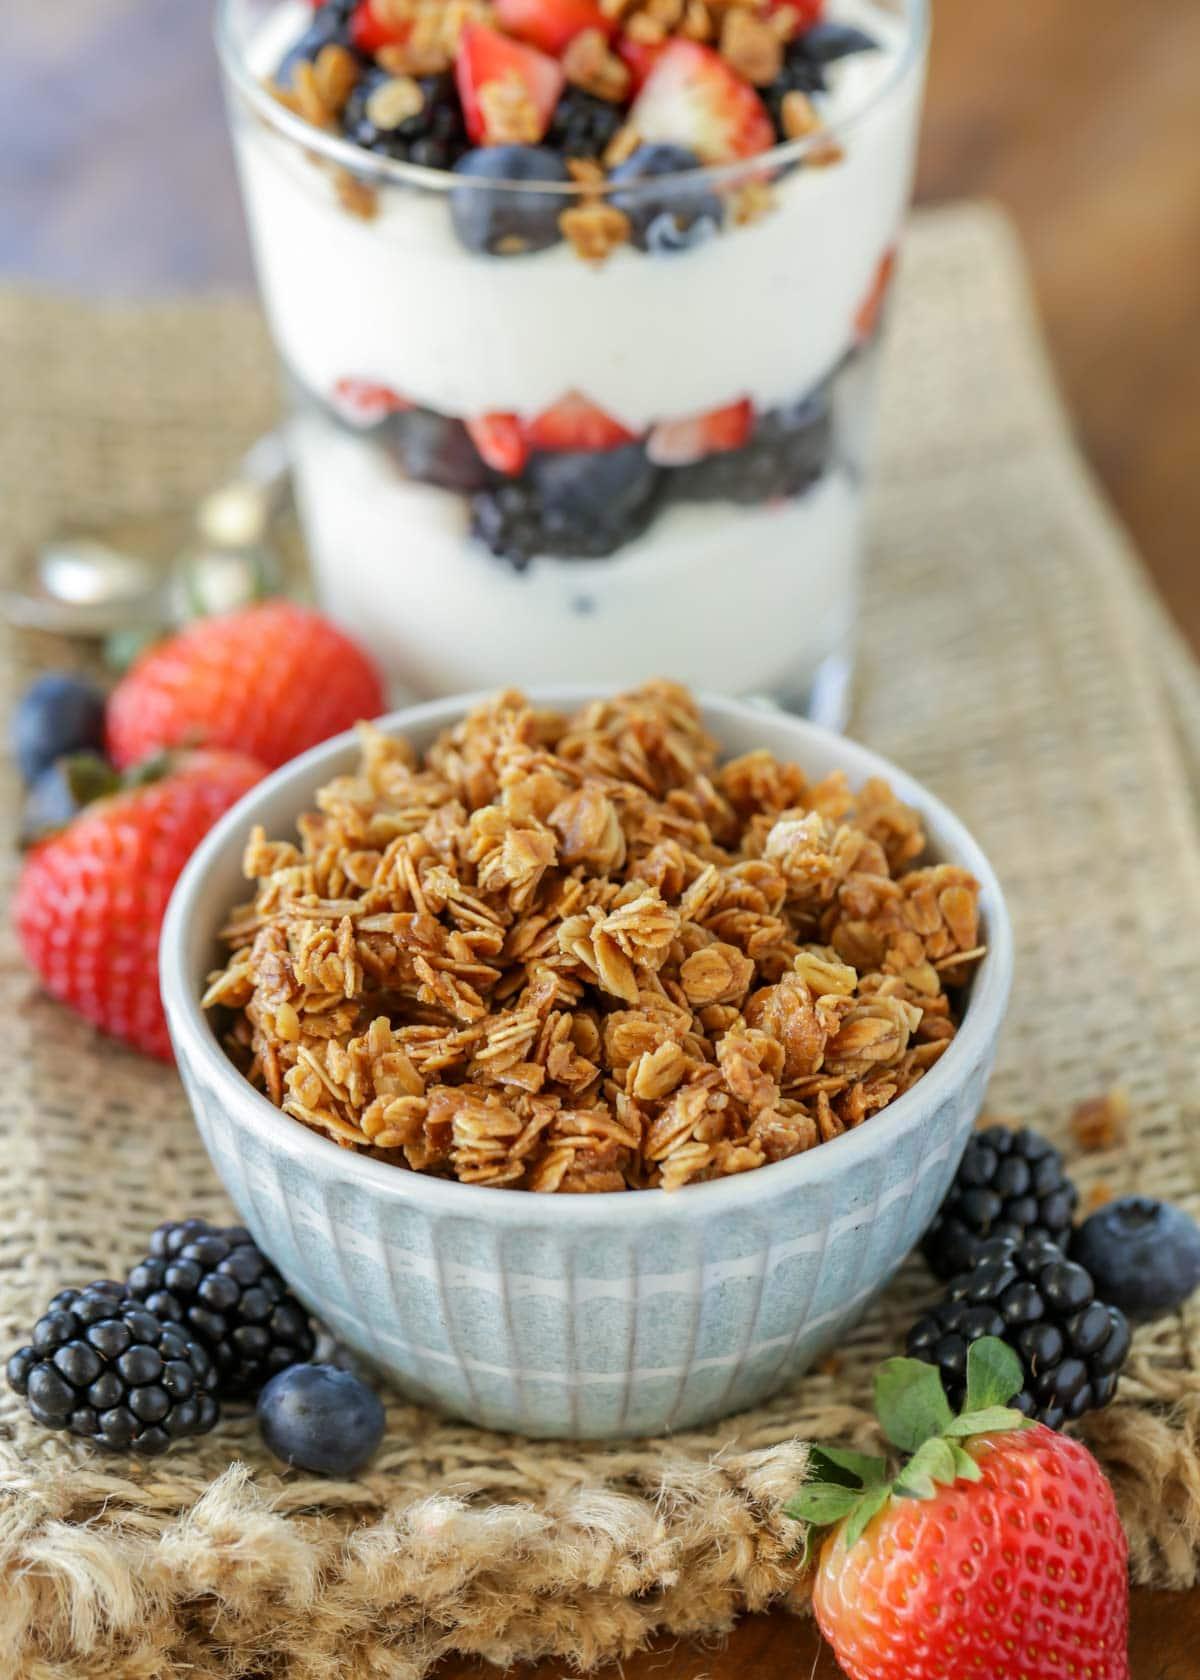 homemade granola in a blue bowl and yogurt parfait